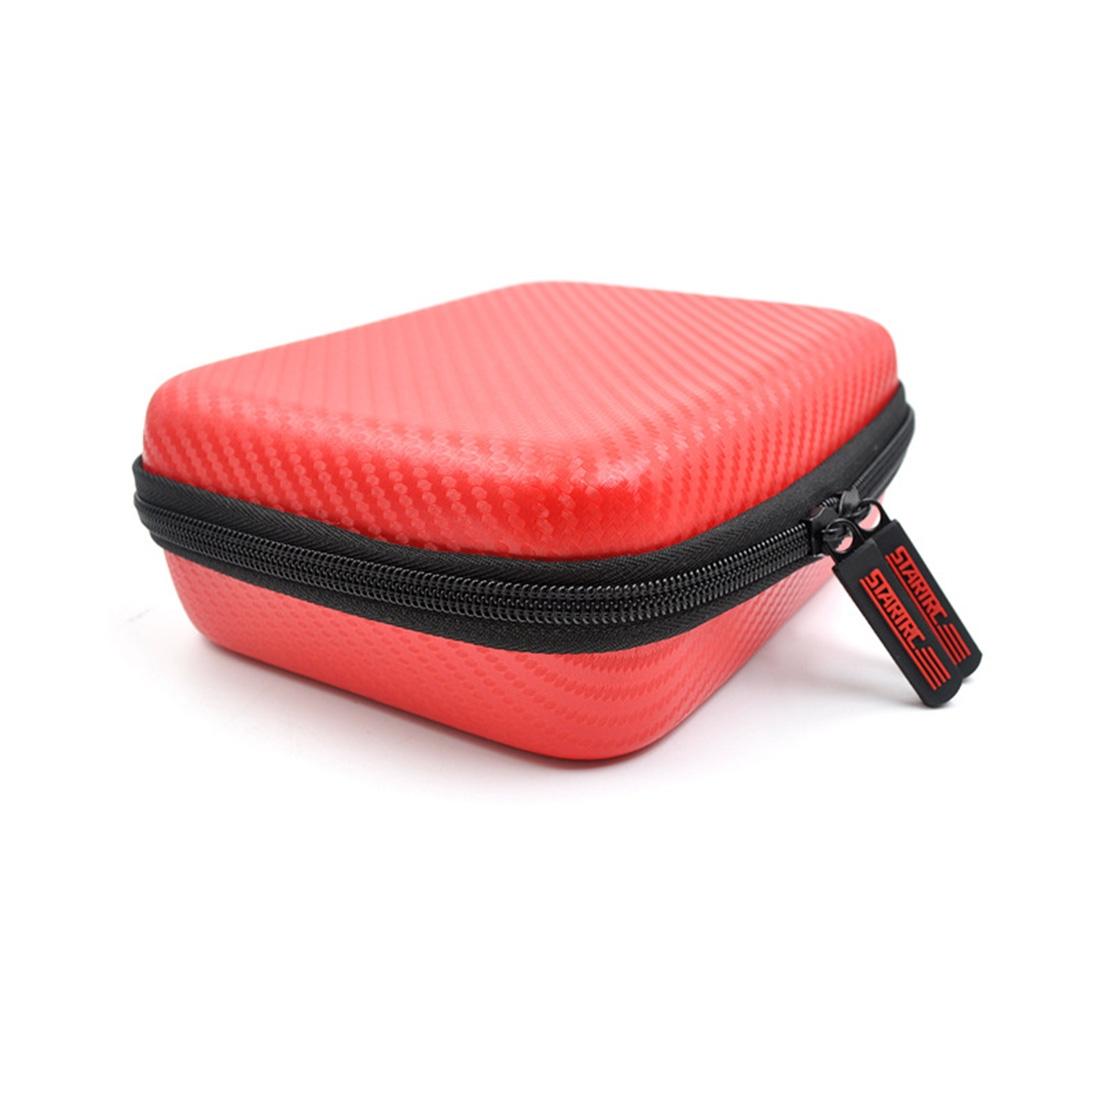 STARTRC Carbon Texture Waterproof PU Storage Bag for DJI OSMO Pocket Gimble Camera (Red)